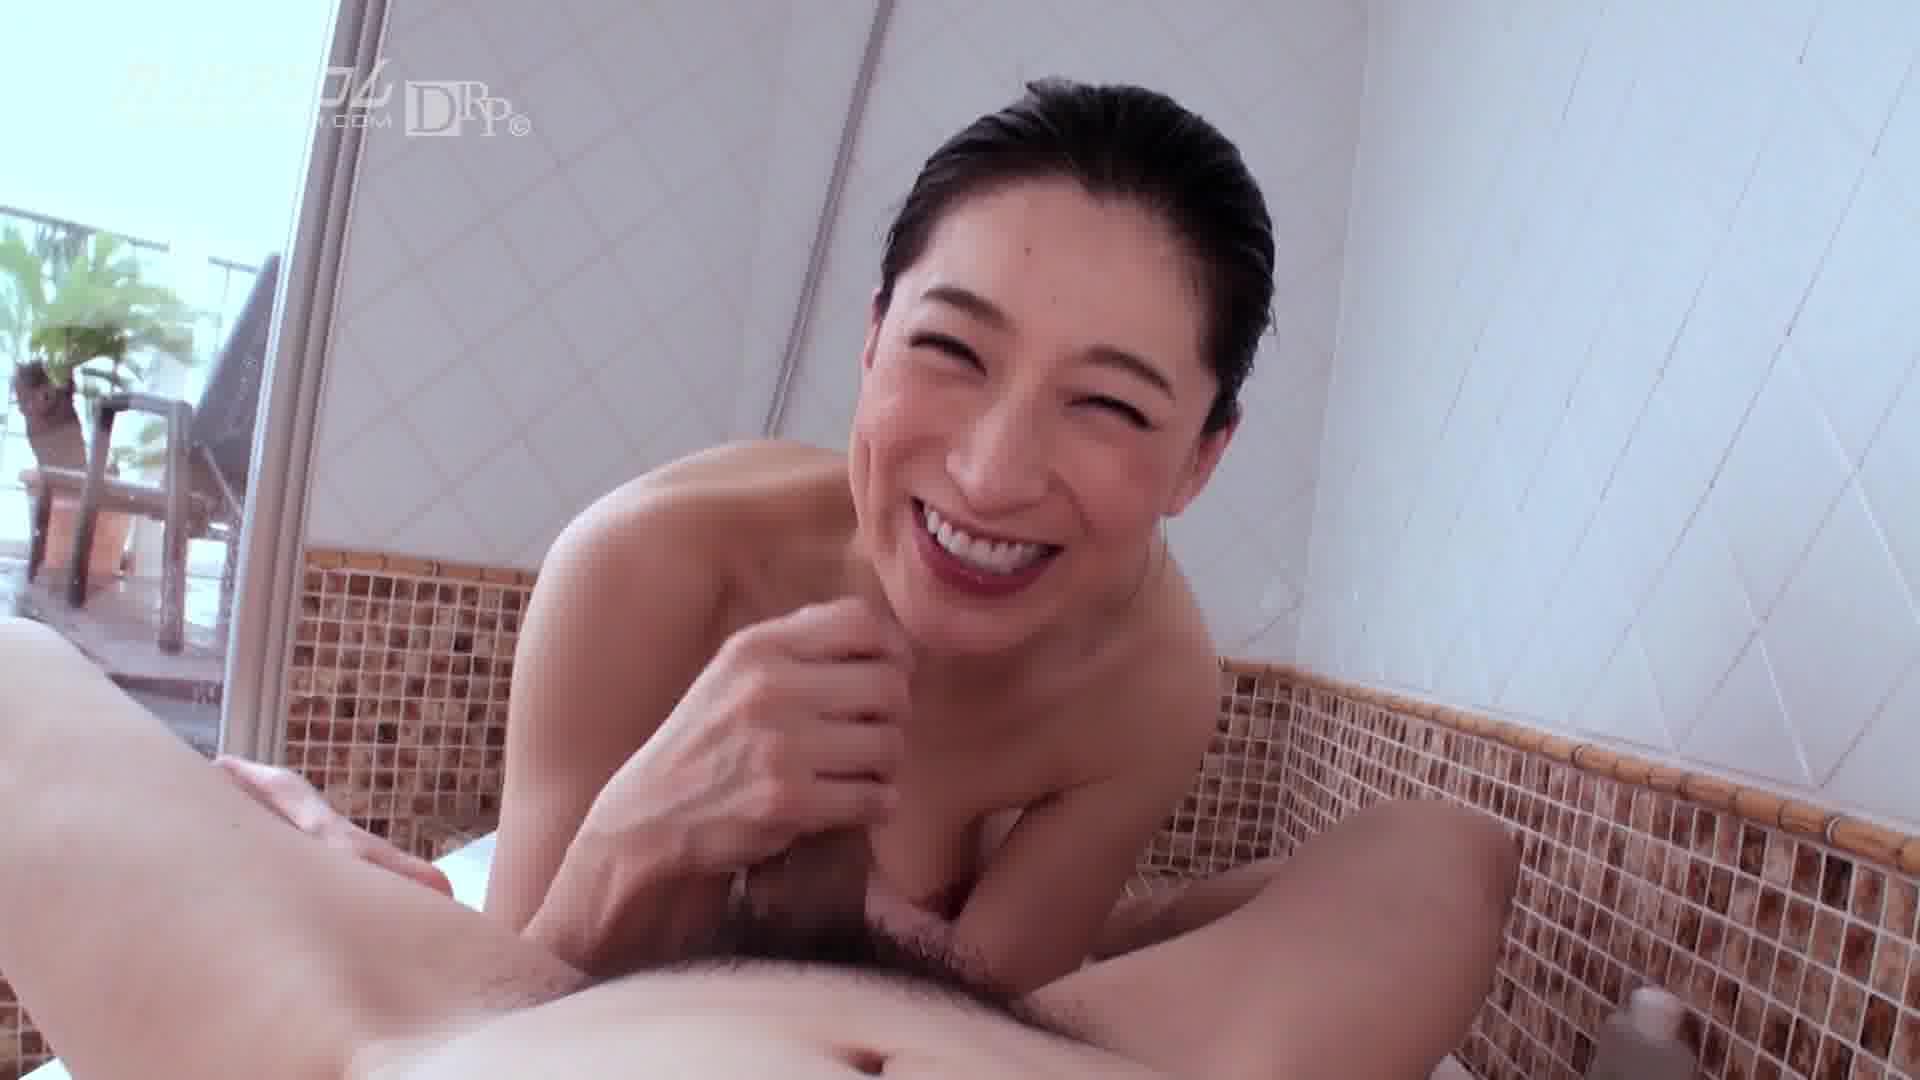 AV女優と飲み…そして泊まりSEX by HAMAR 8 後編 - 松本まりな【ハメ撮り・アナル・中出し】